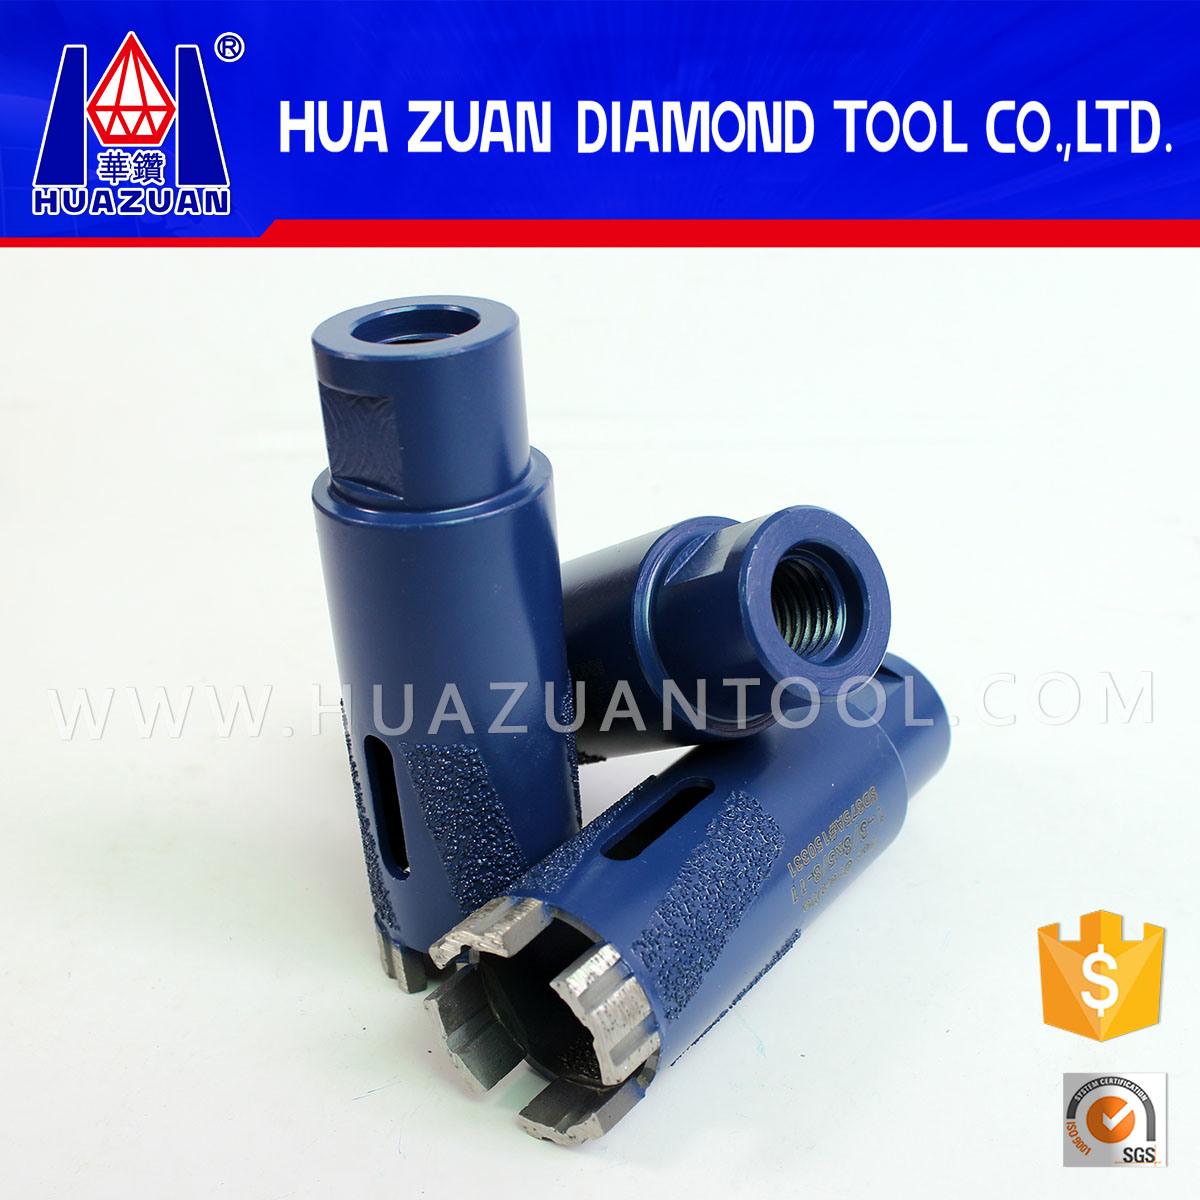 35mm Wet Brazed Diamond Drill Bits